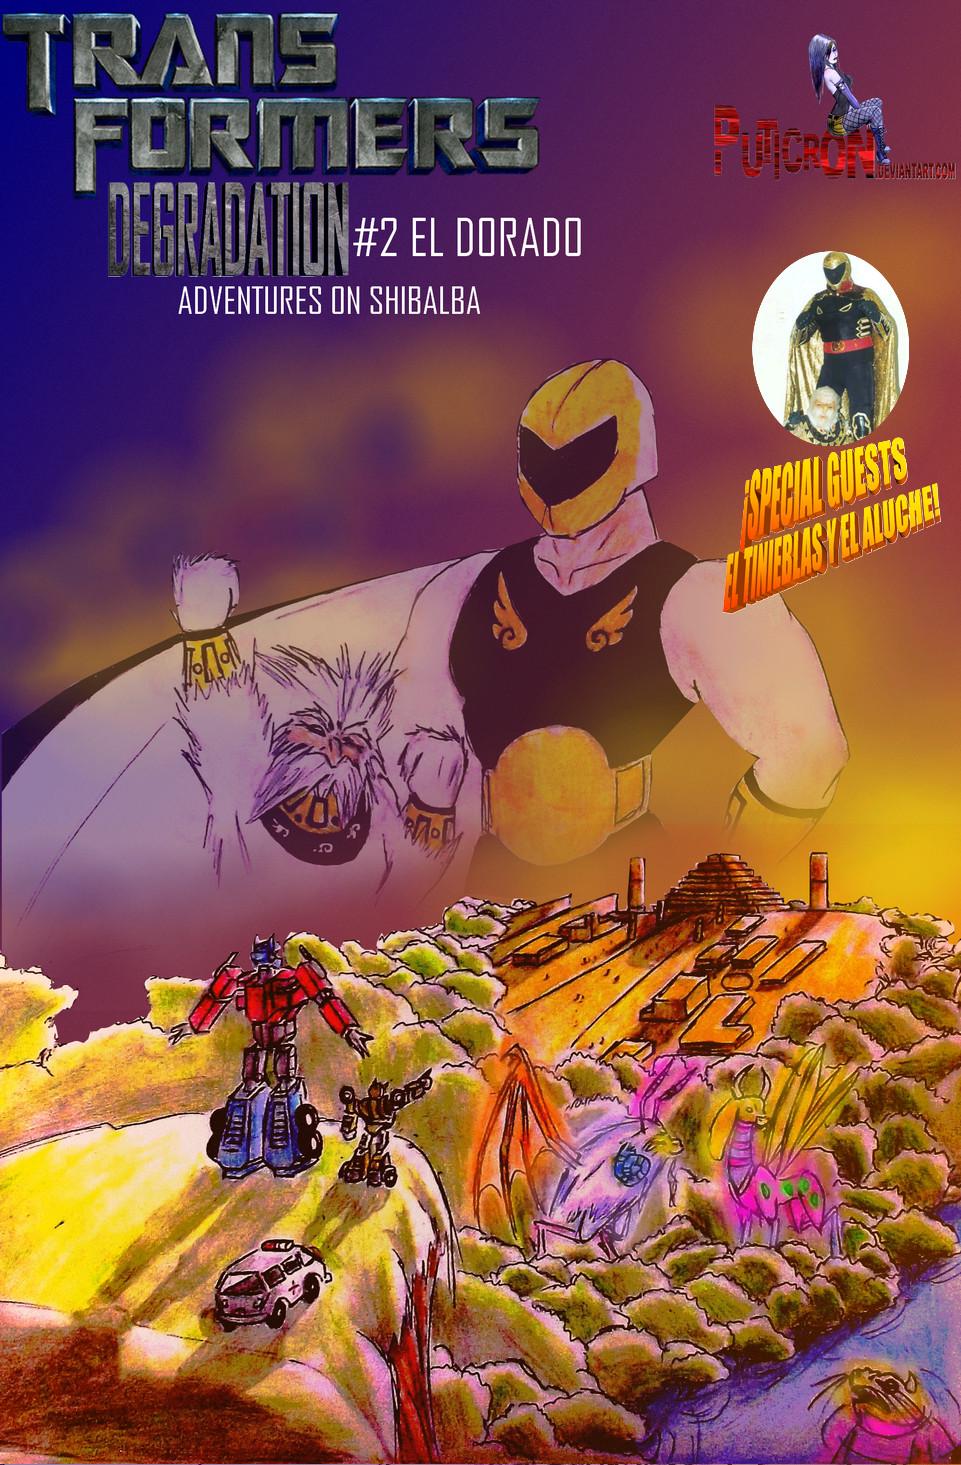 transformers fakesmovies y mas fanarts by me :D - Página 6 Transformers_degradation_issue___2__fake__by_puticron-d5xg3z3